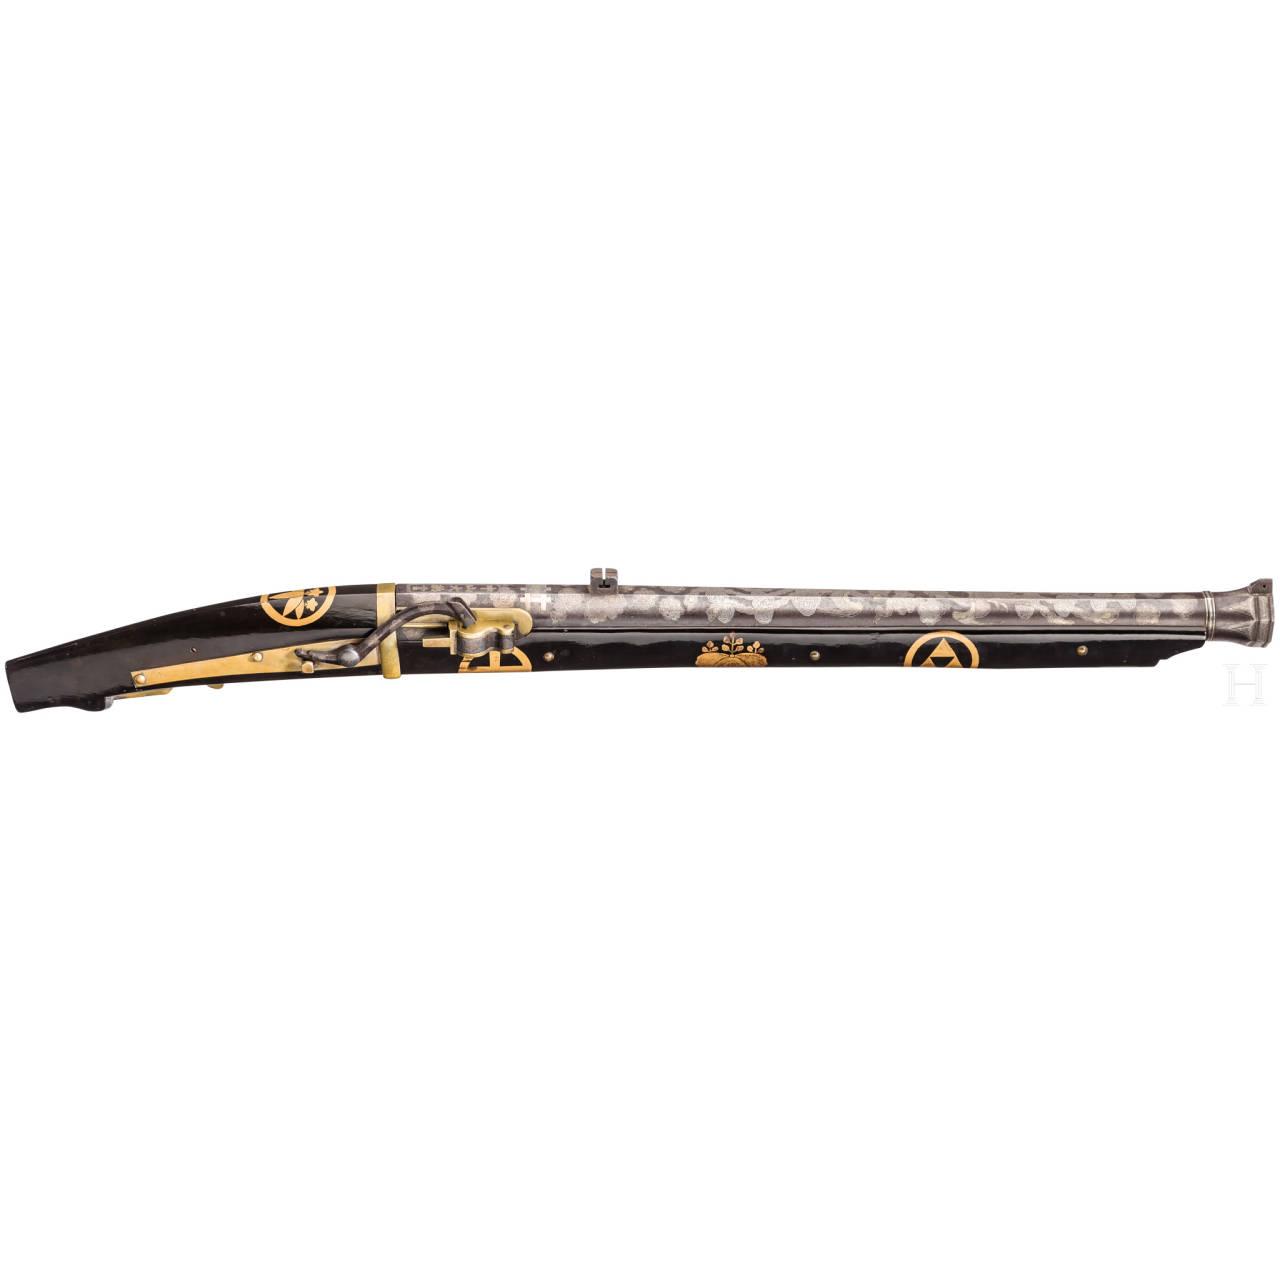 Nami Tsutsu, Japan, späte Edo-Periode/frühe Meiji-Periode